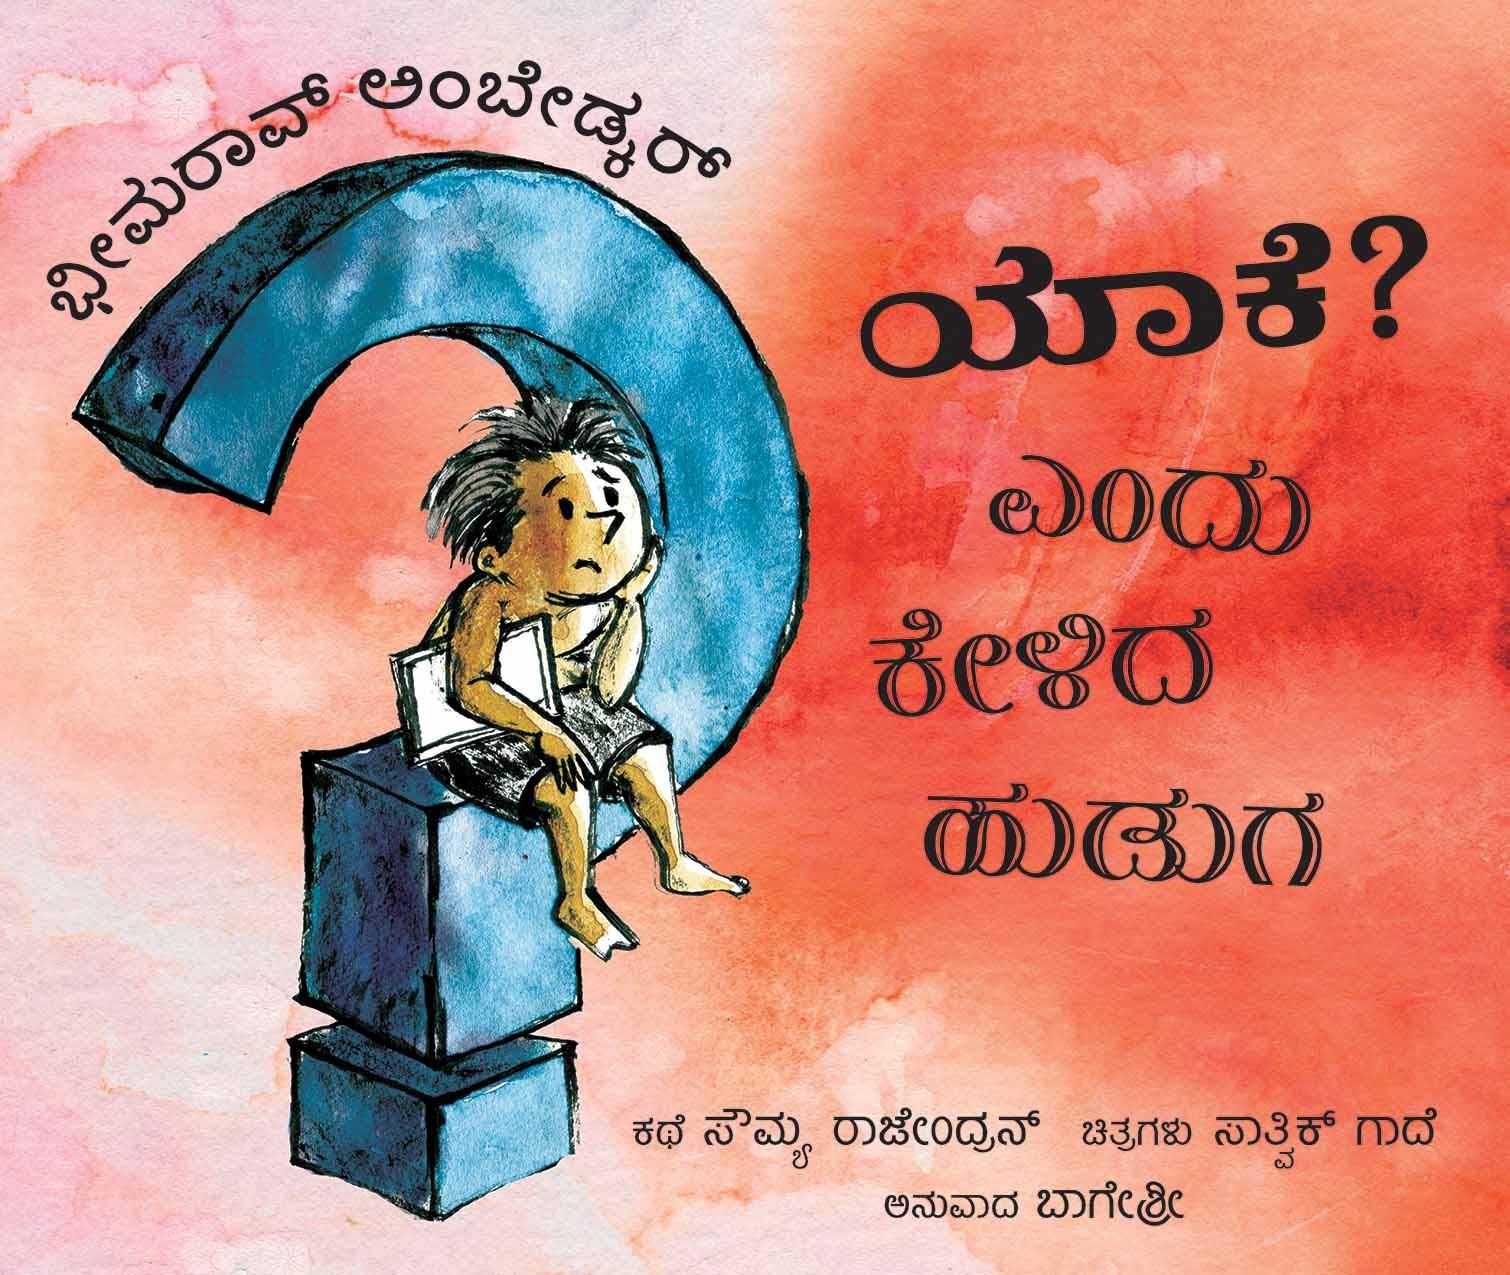 Bhimrao Ambedkar: The Boy Who Asked Why/Bhimrao Ambedkar: Yaake Endu Kelida Huduga (Kannada)